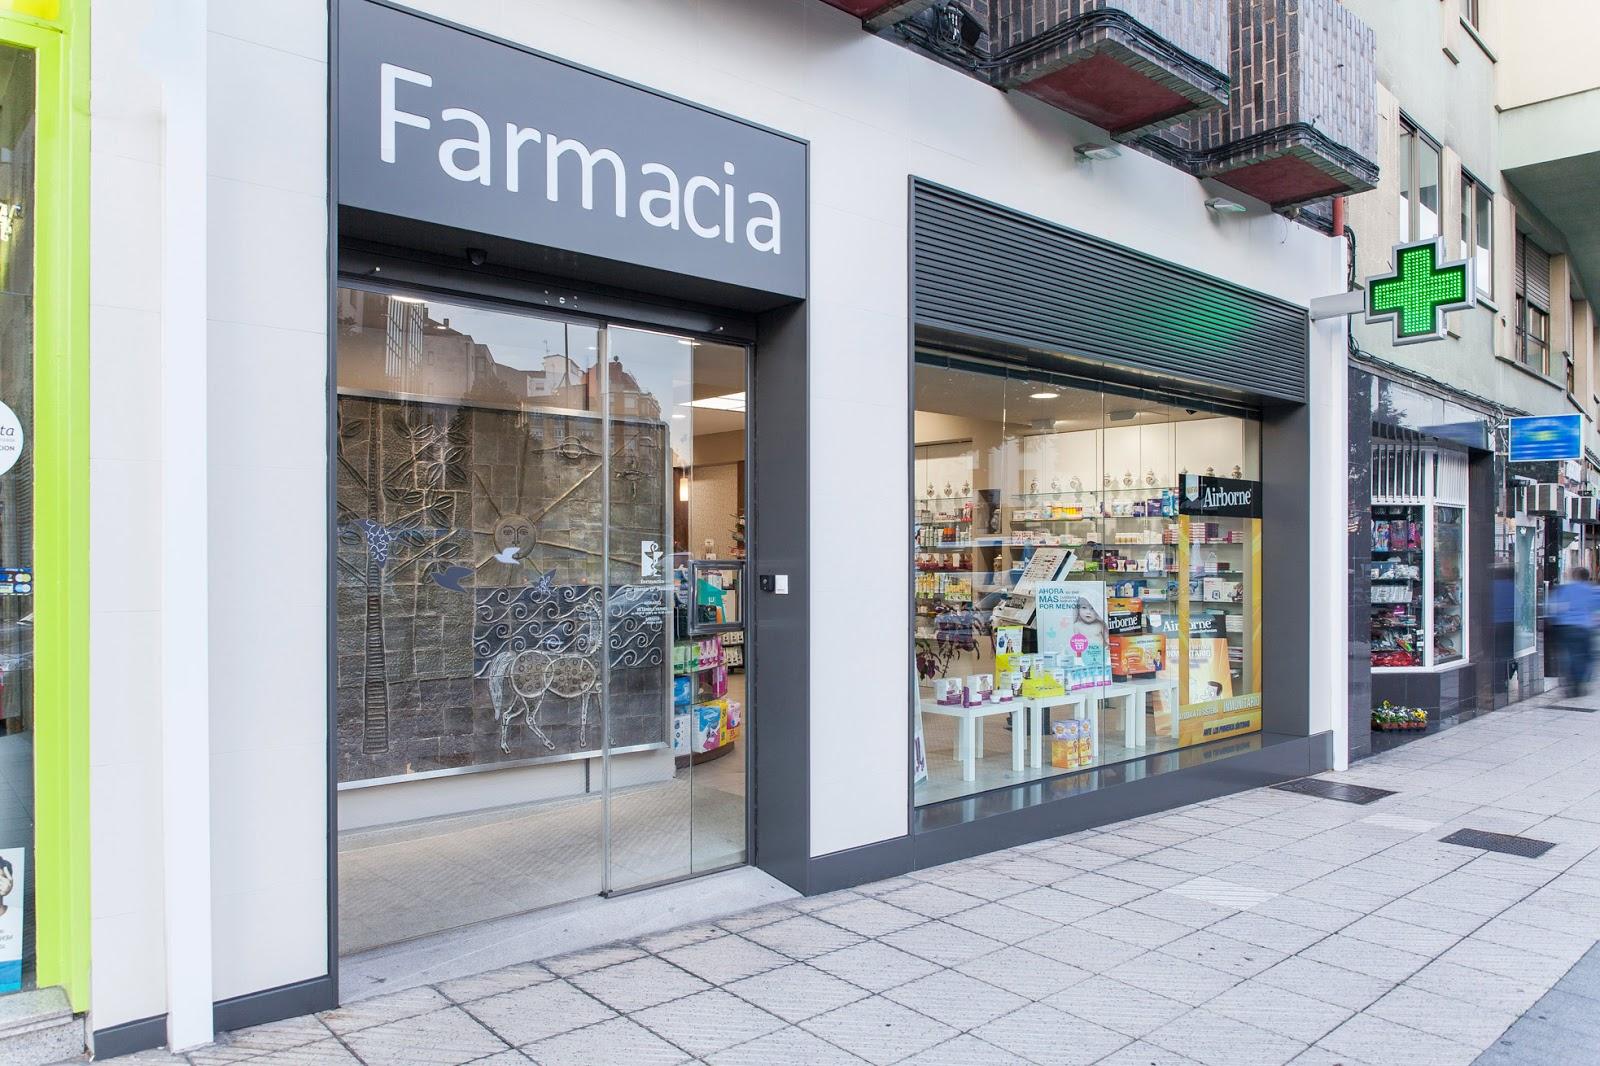 Iarquitectura Reforma De Farmacias Dise O De Farmacias